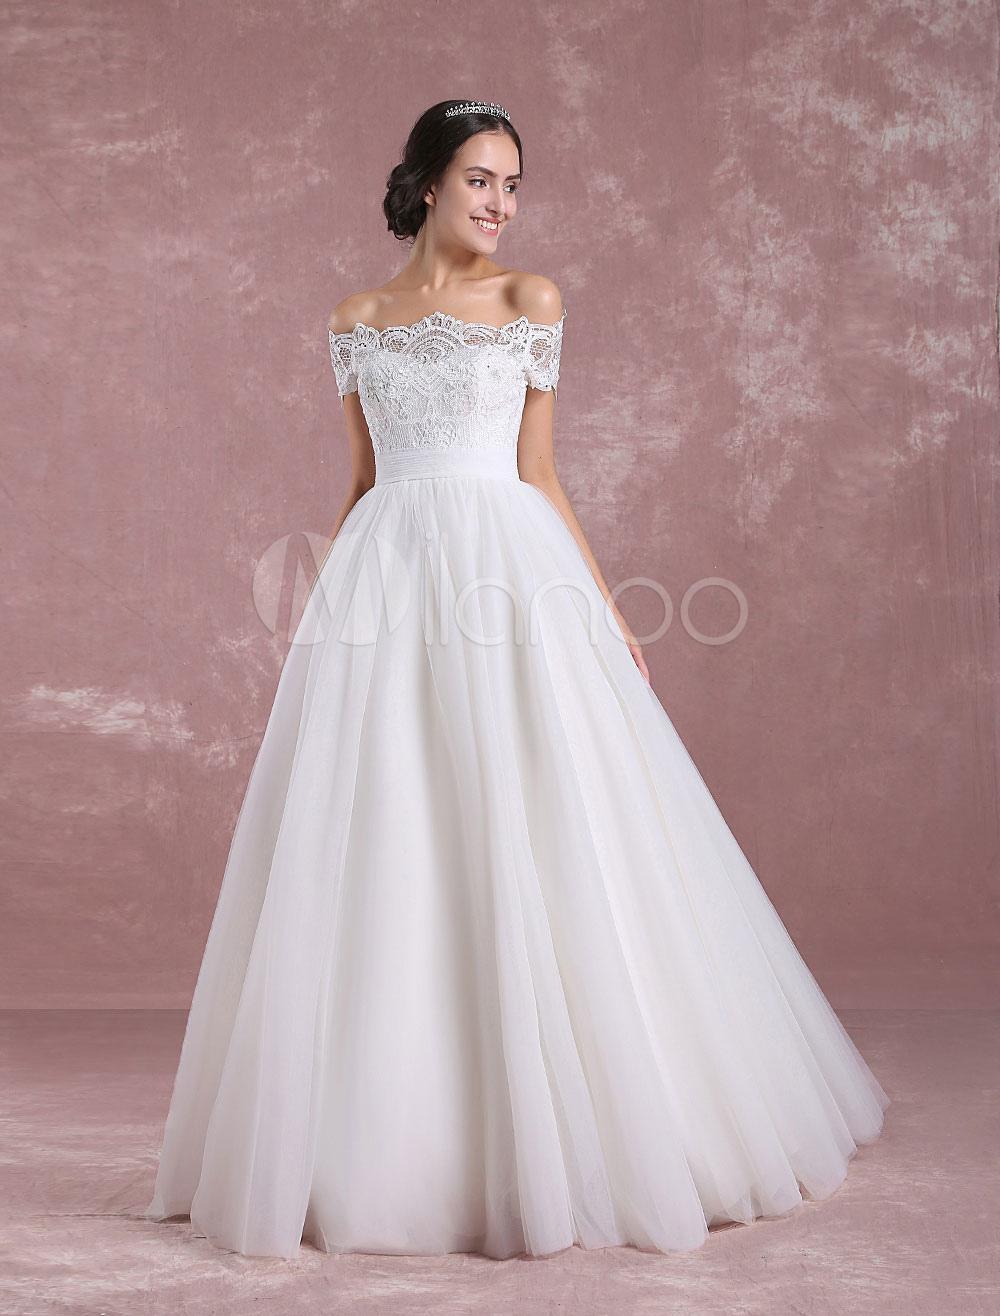 Princess Wedding Dress Off The Shoulder Tulle Bridal Dress Ivory Lace Floor Length Bridal Gown